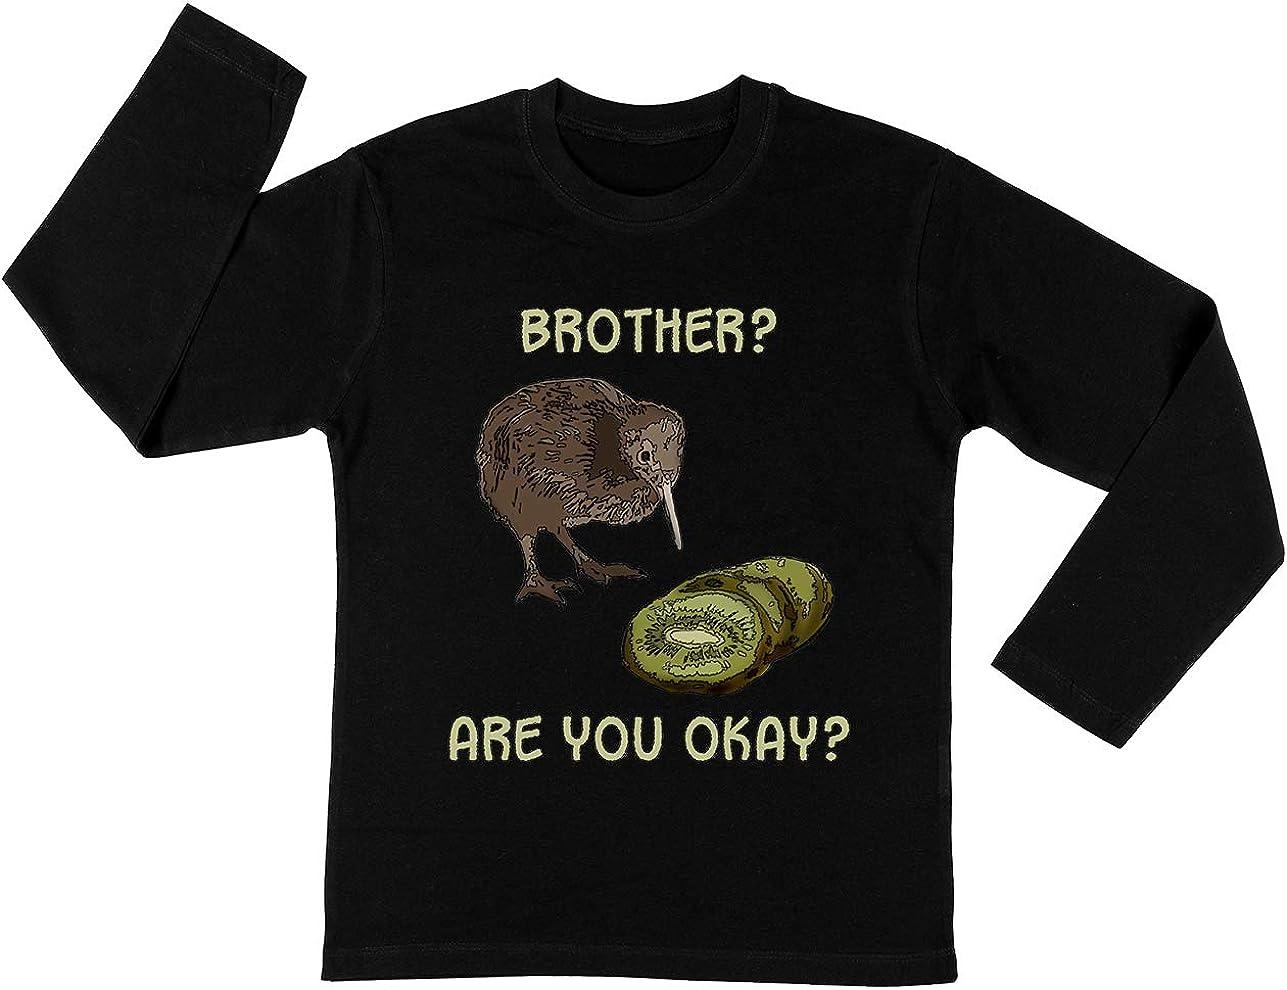 Los Kiwi Es Muerto Unisexo Niño Niña Camiseta Manga Larga Negro Todos Los Tamaños - Unisex Kids Boys Girls Long Sleeve T-Shirt Black: Amazon.es: Ropa y accesorios